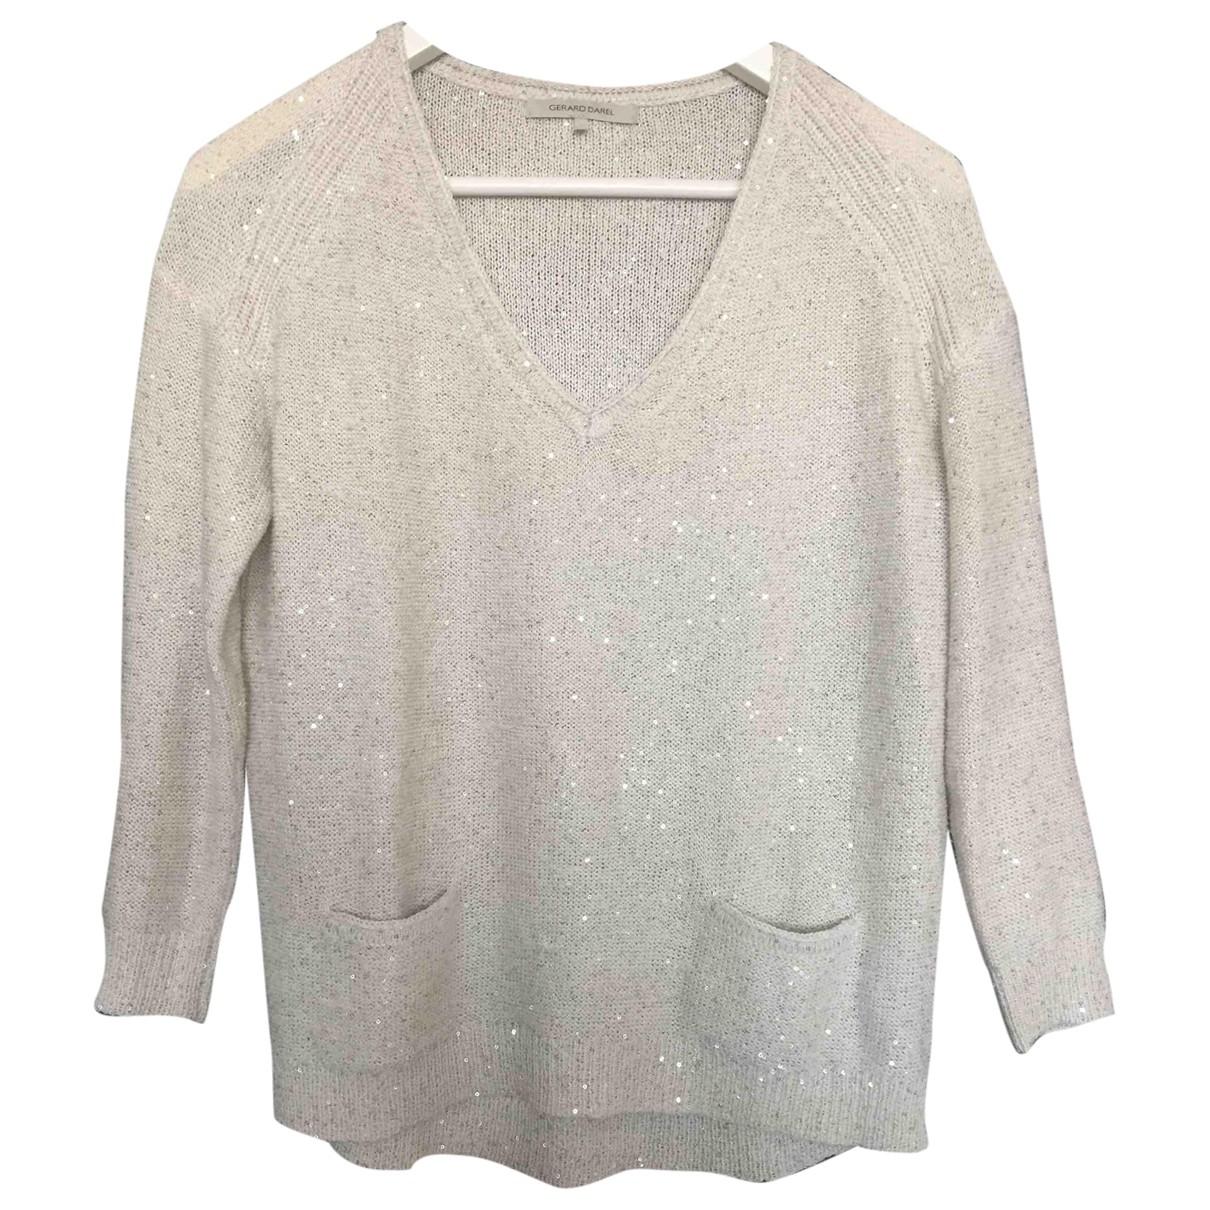 Gerard Darel \N Ecru Cotton Knitwear for Women S International